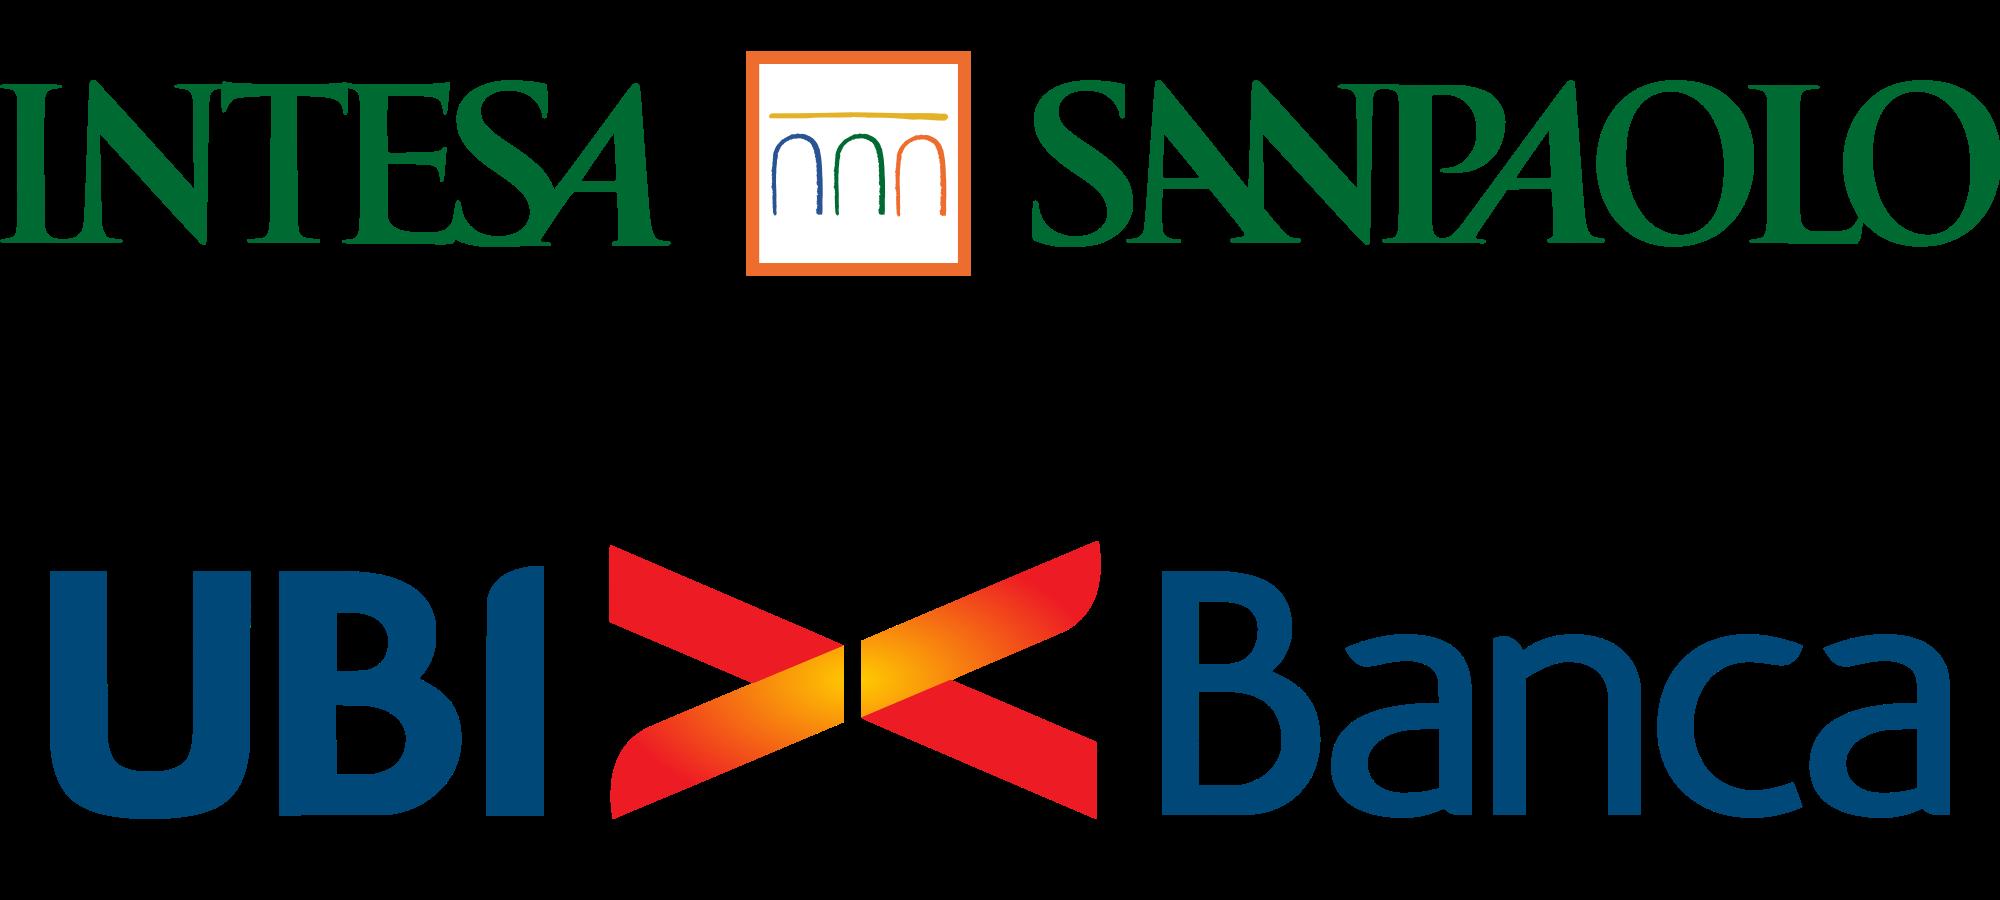 OPAS di Intesa Sanpaolo su UBI Banca, tutta la storia